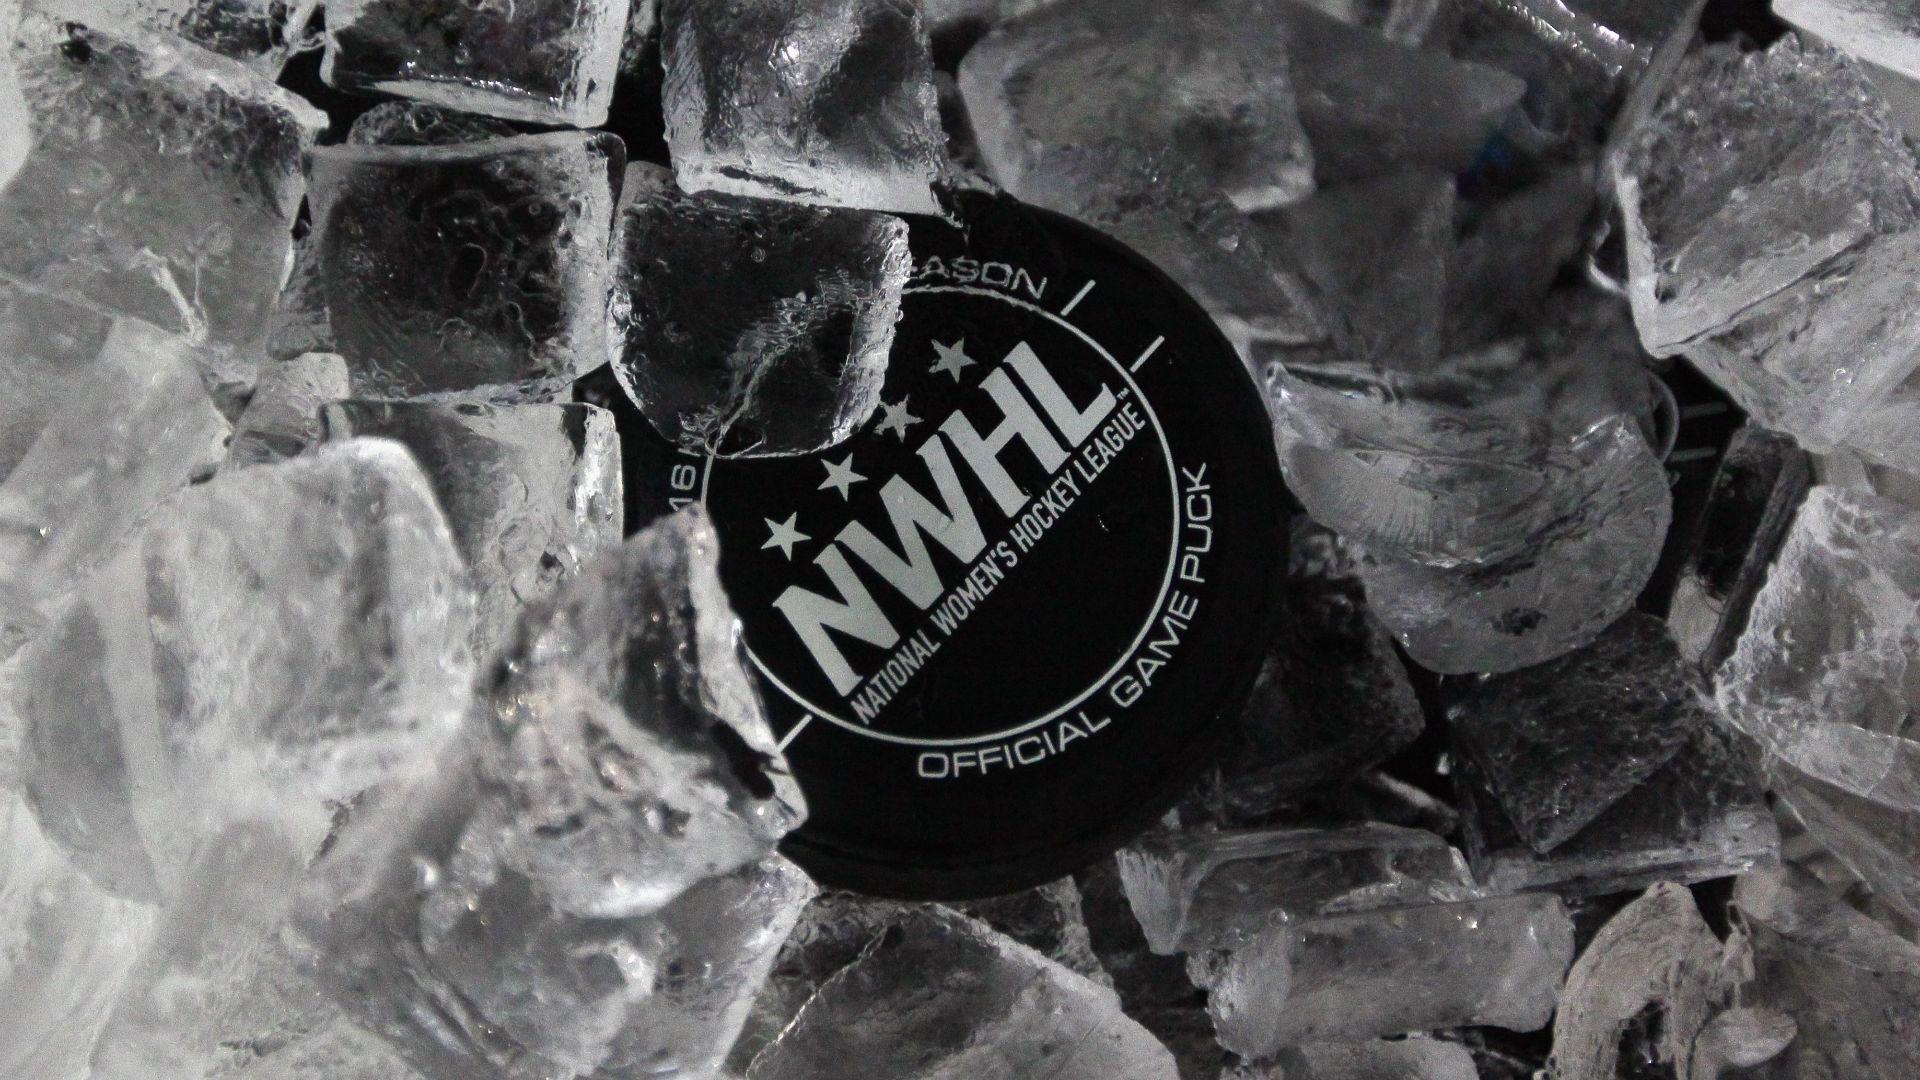 NWHL Draft results 2020: Boston Pride select Sammy Davis No. 1 overall